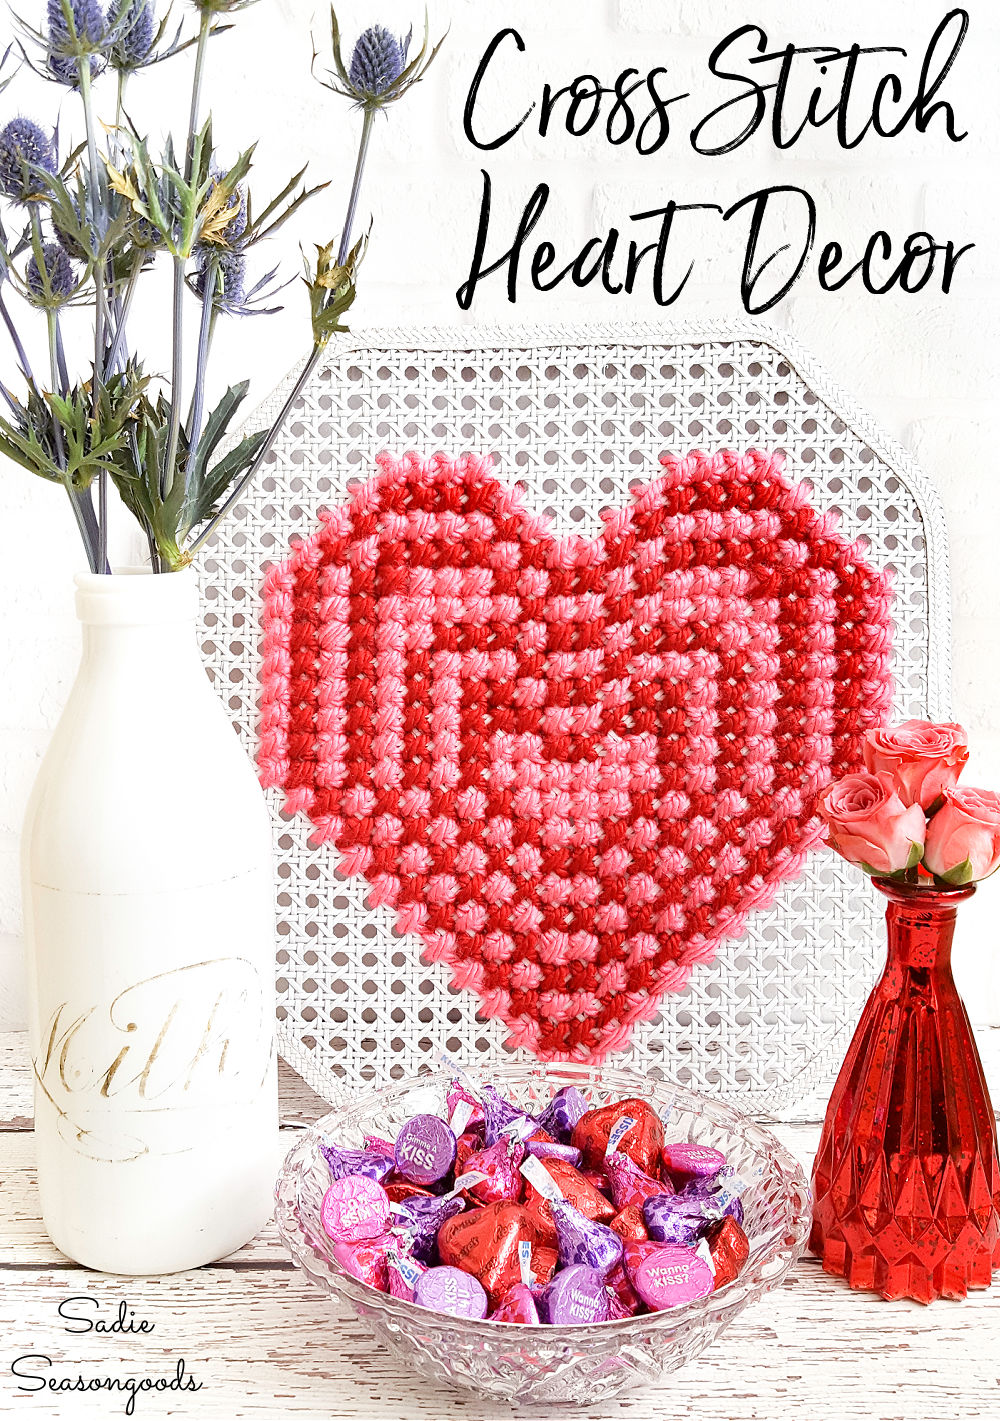 Heart cross stitch on cane webbing